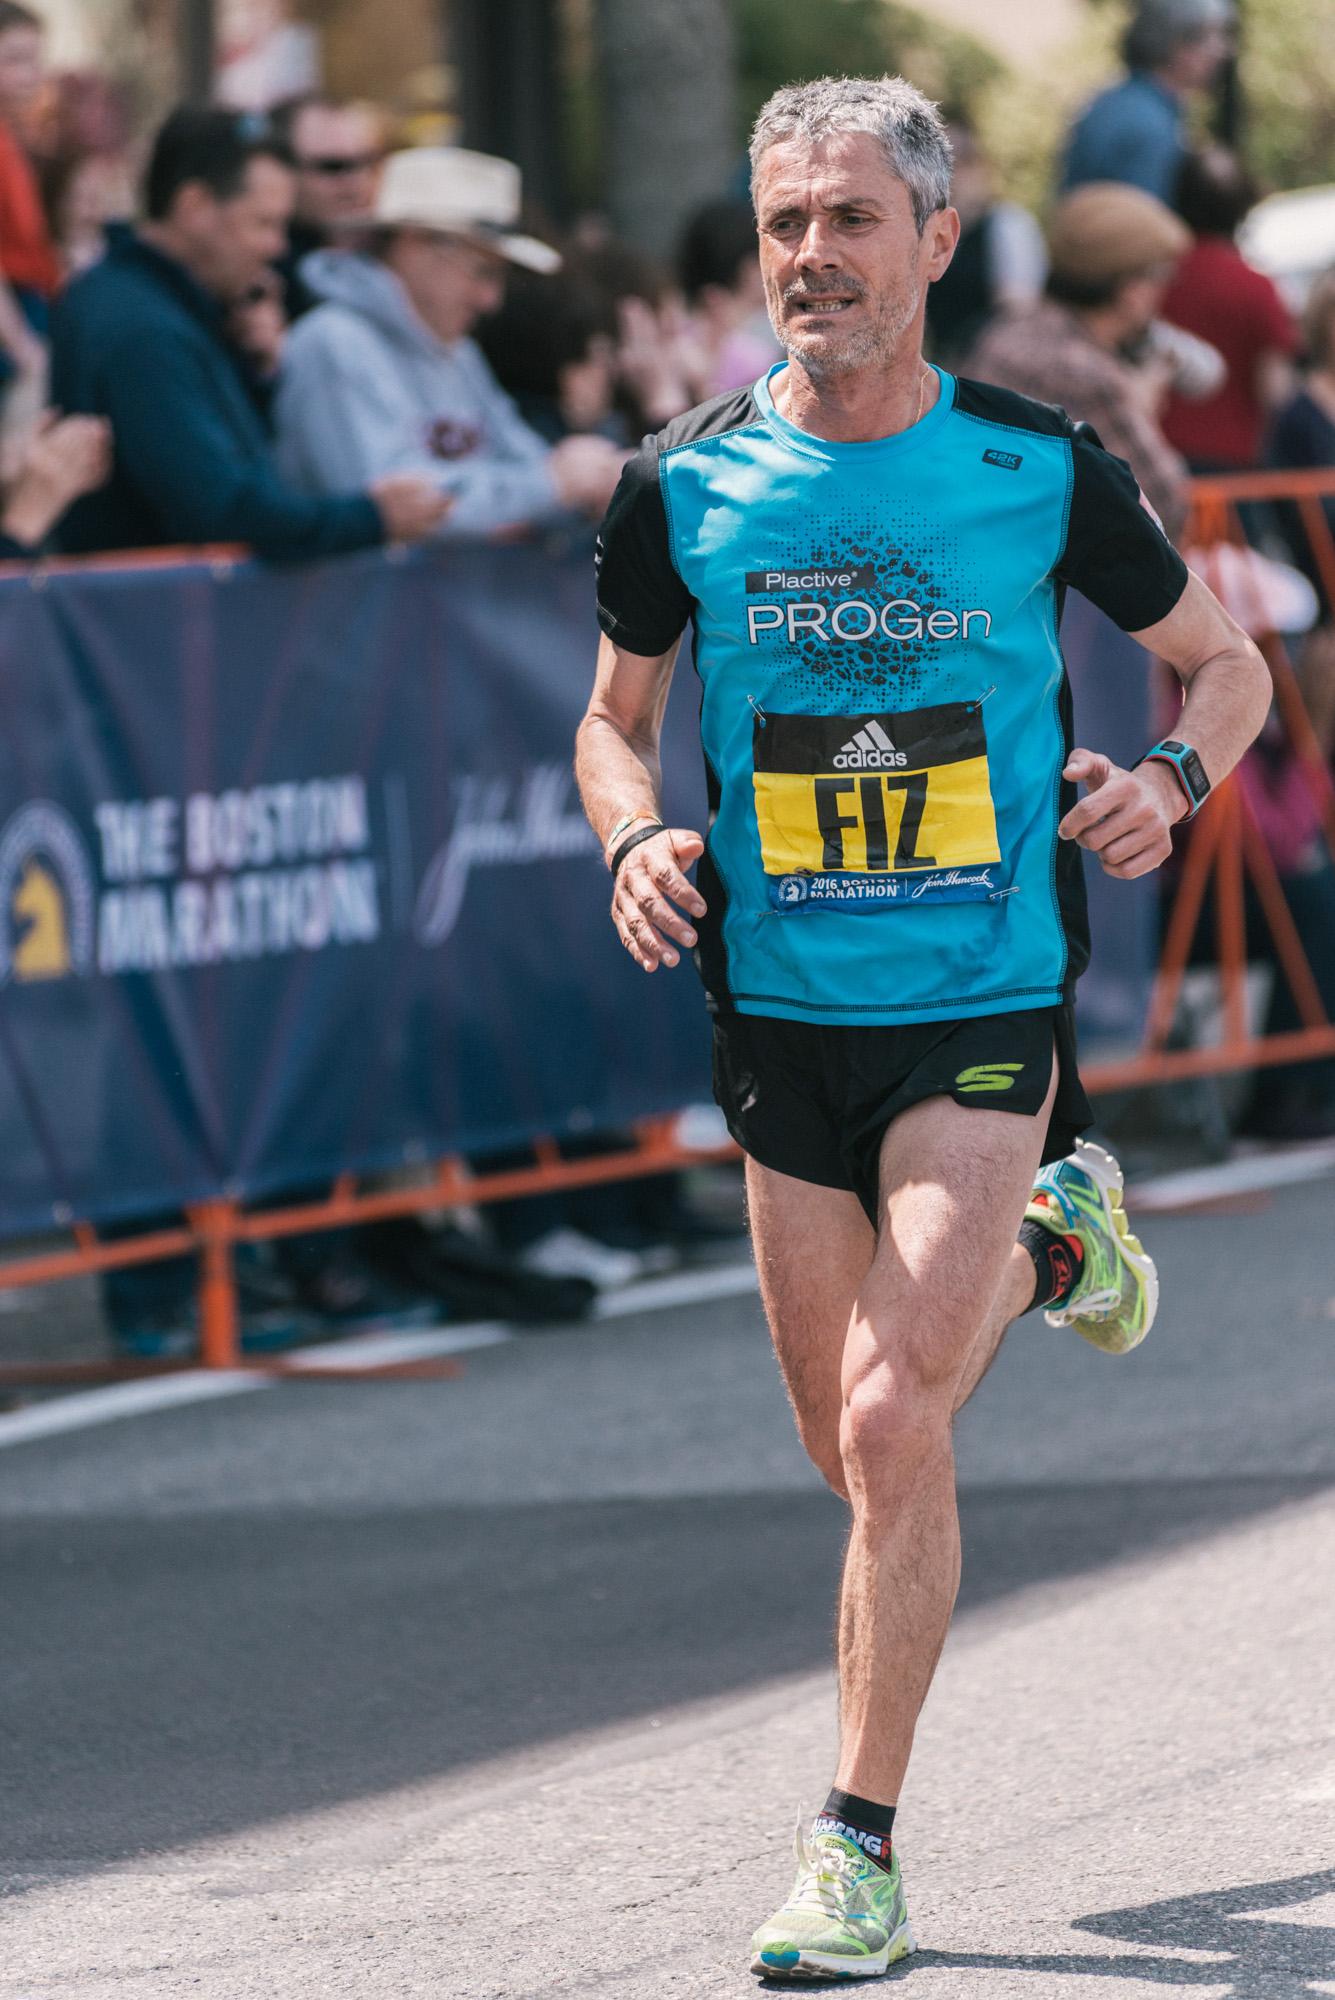 Martin Fiz - 34th place